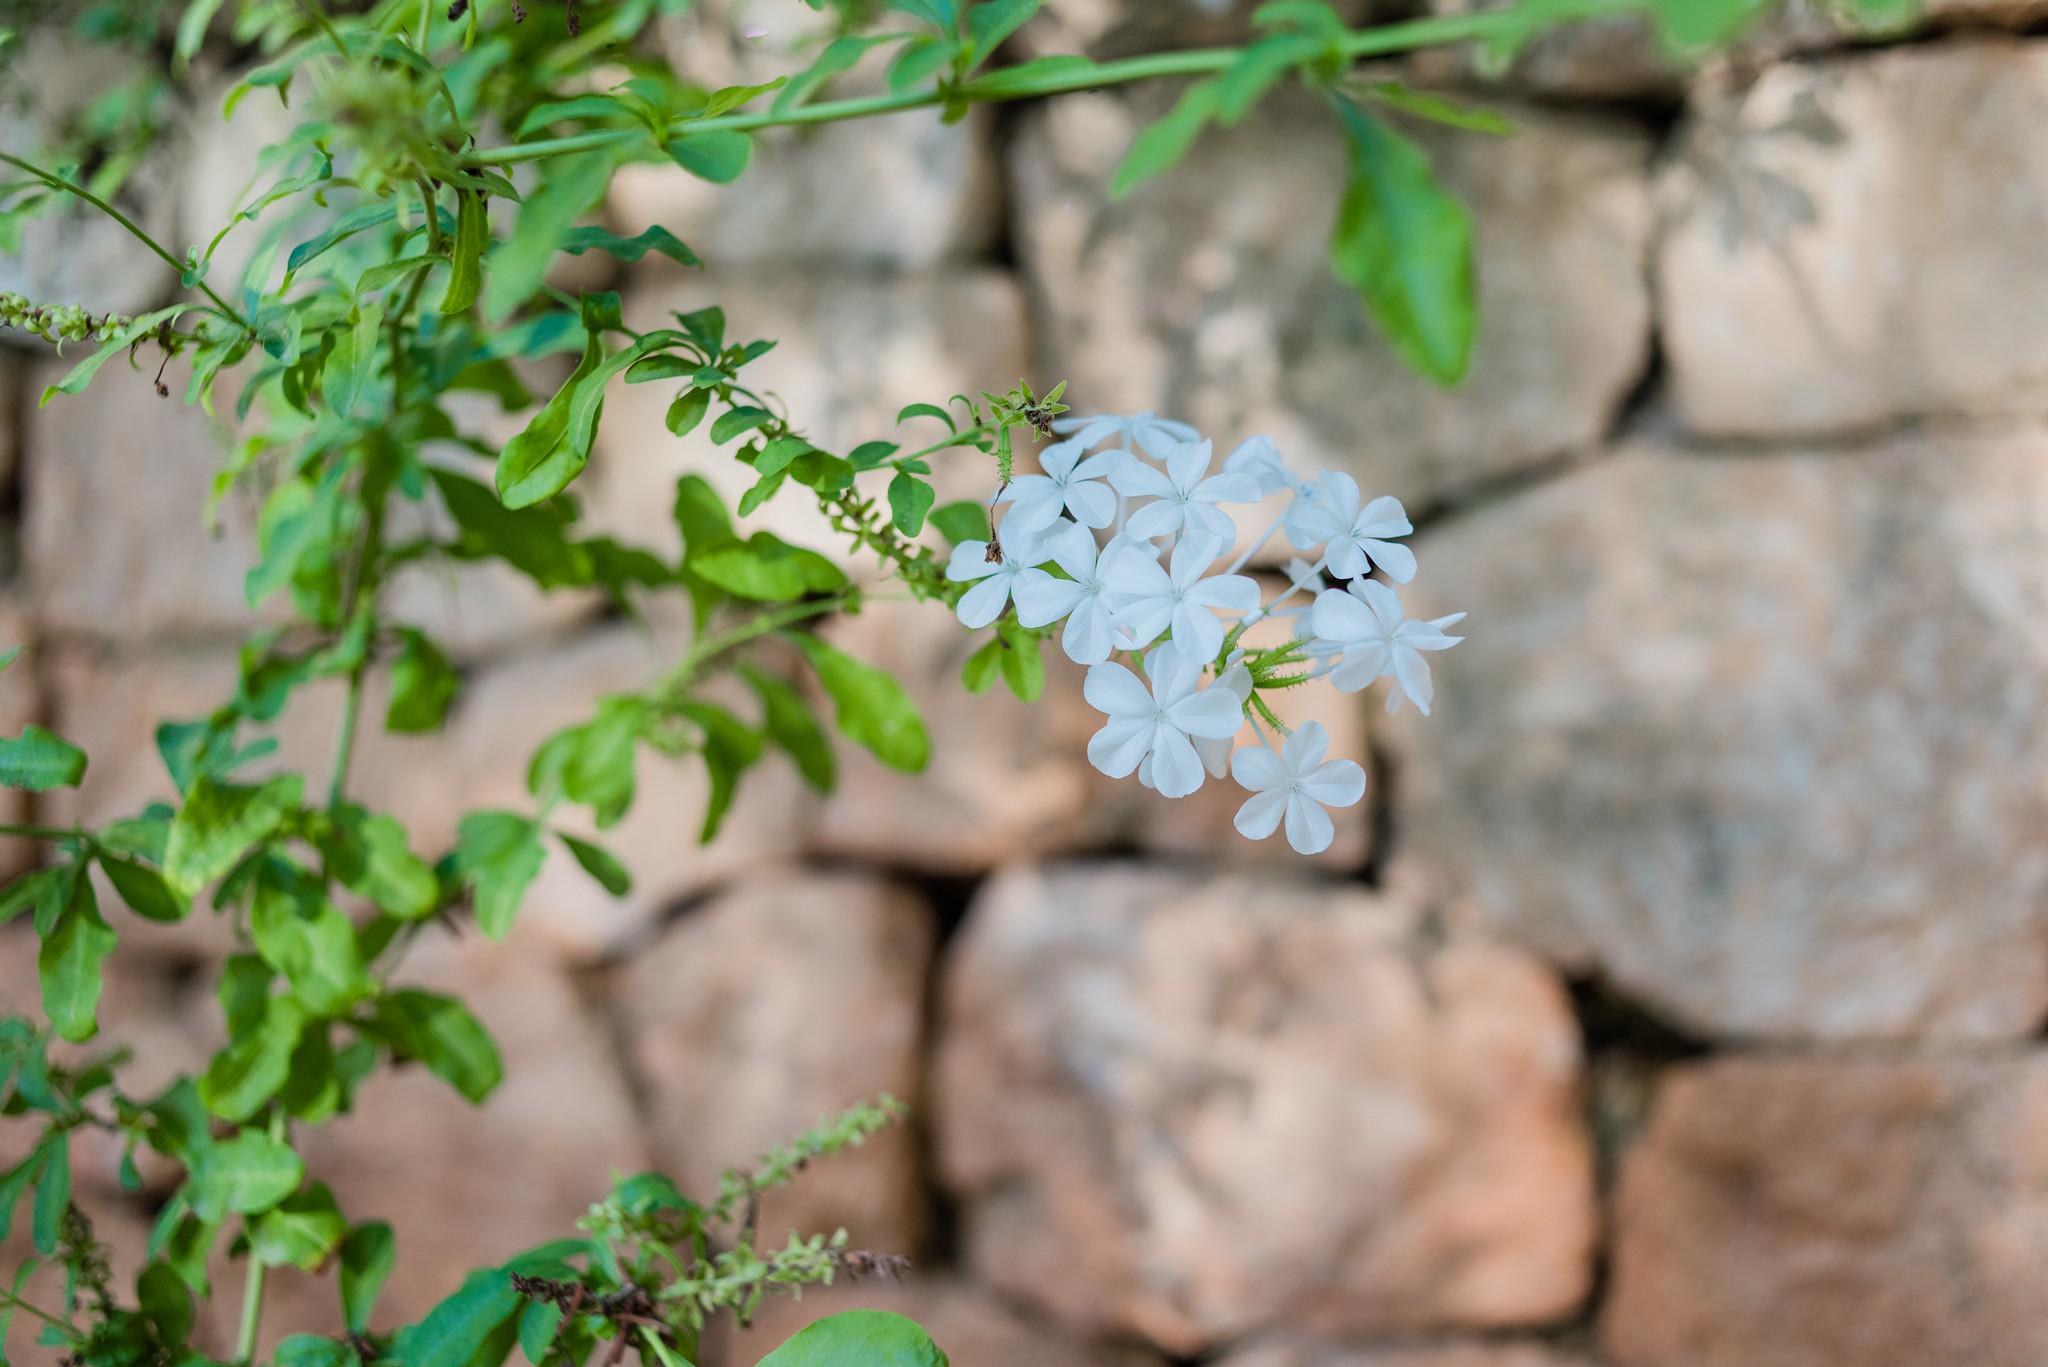 https://www.white-ibiza.com/wp-content/uploads/2020/05/white-ibiza-villas-casa-amalia-exterior-flower.jpg